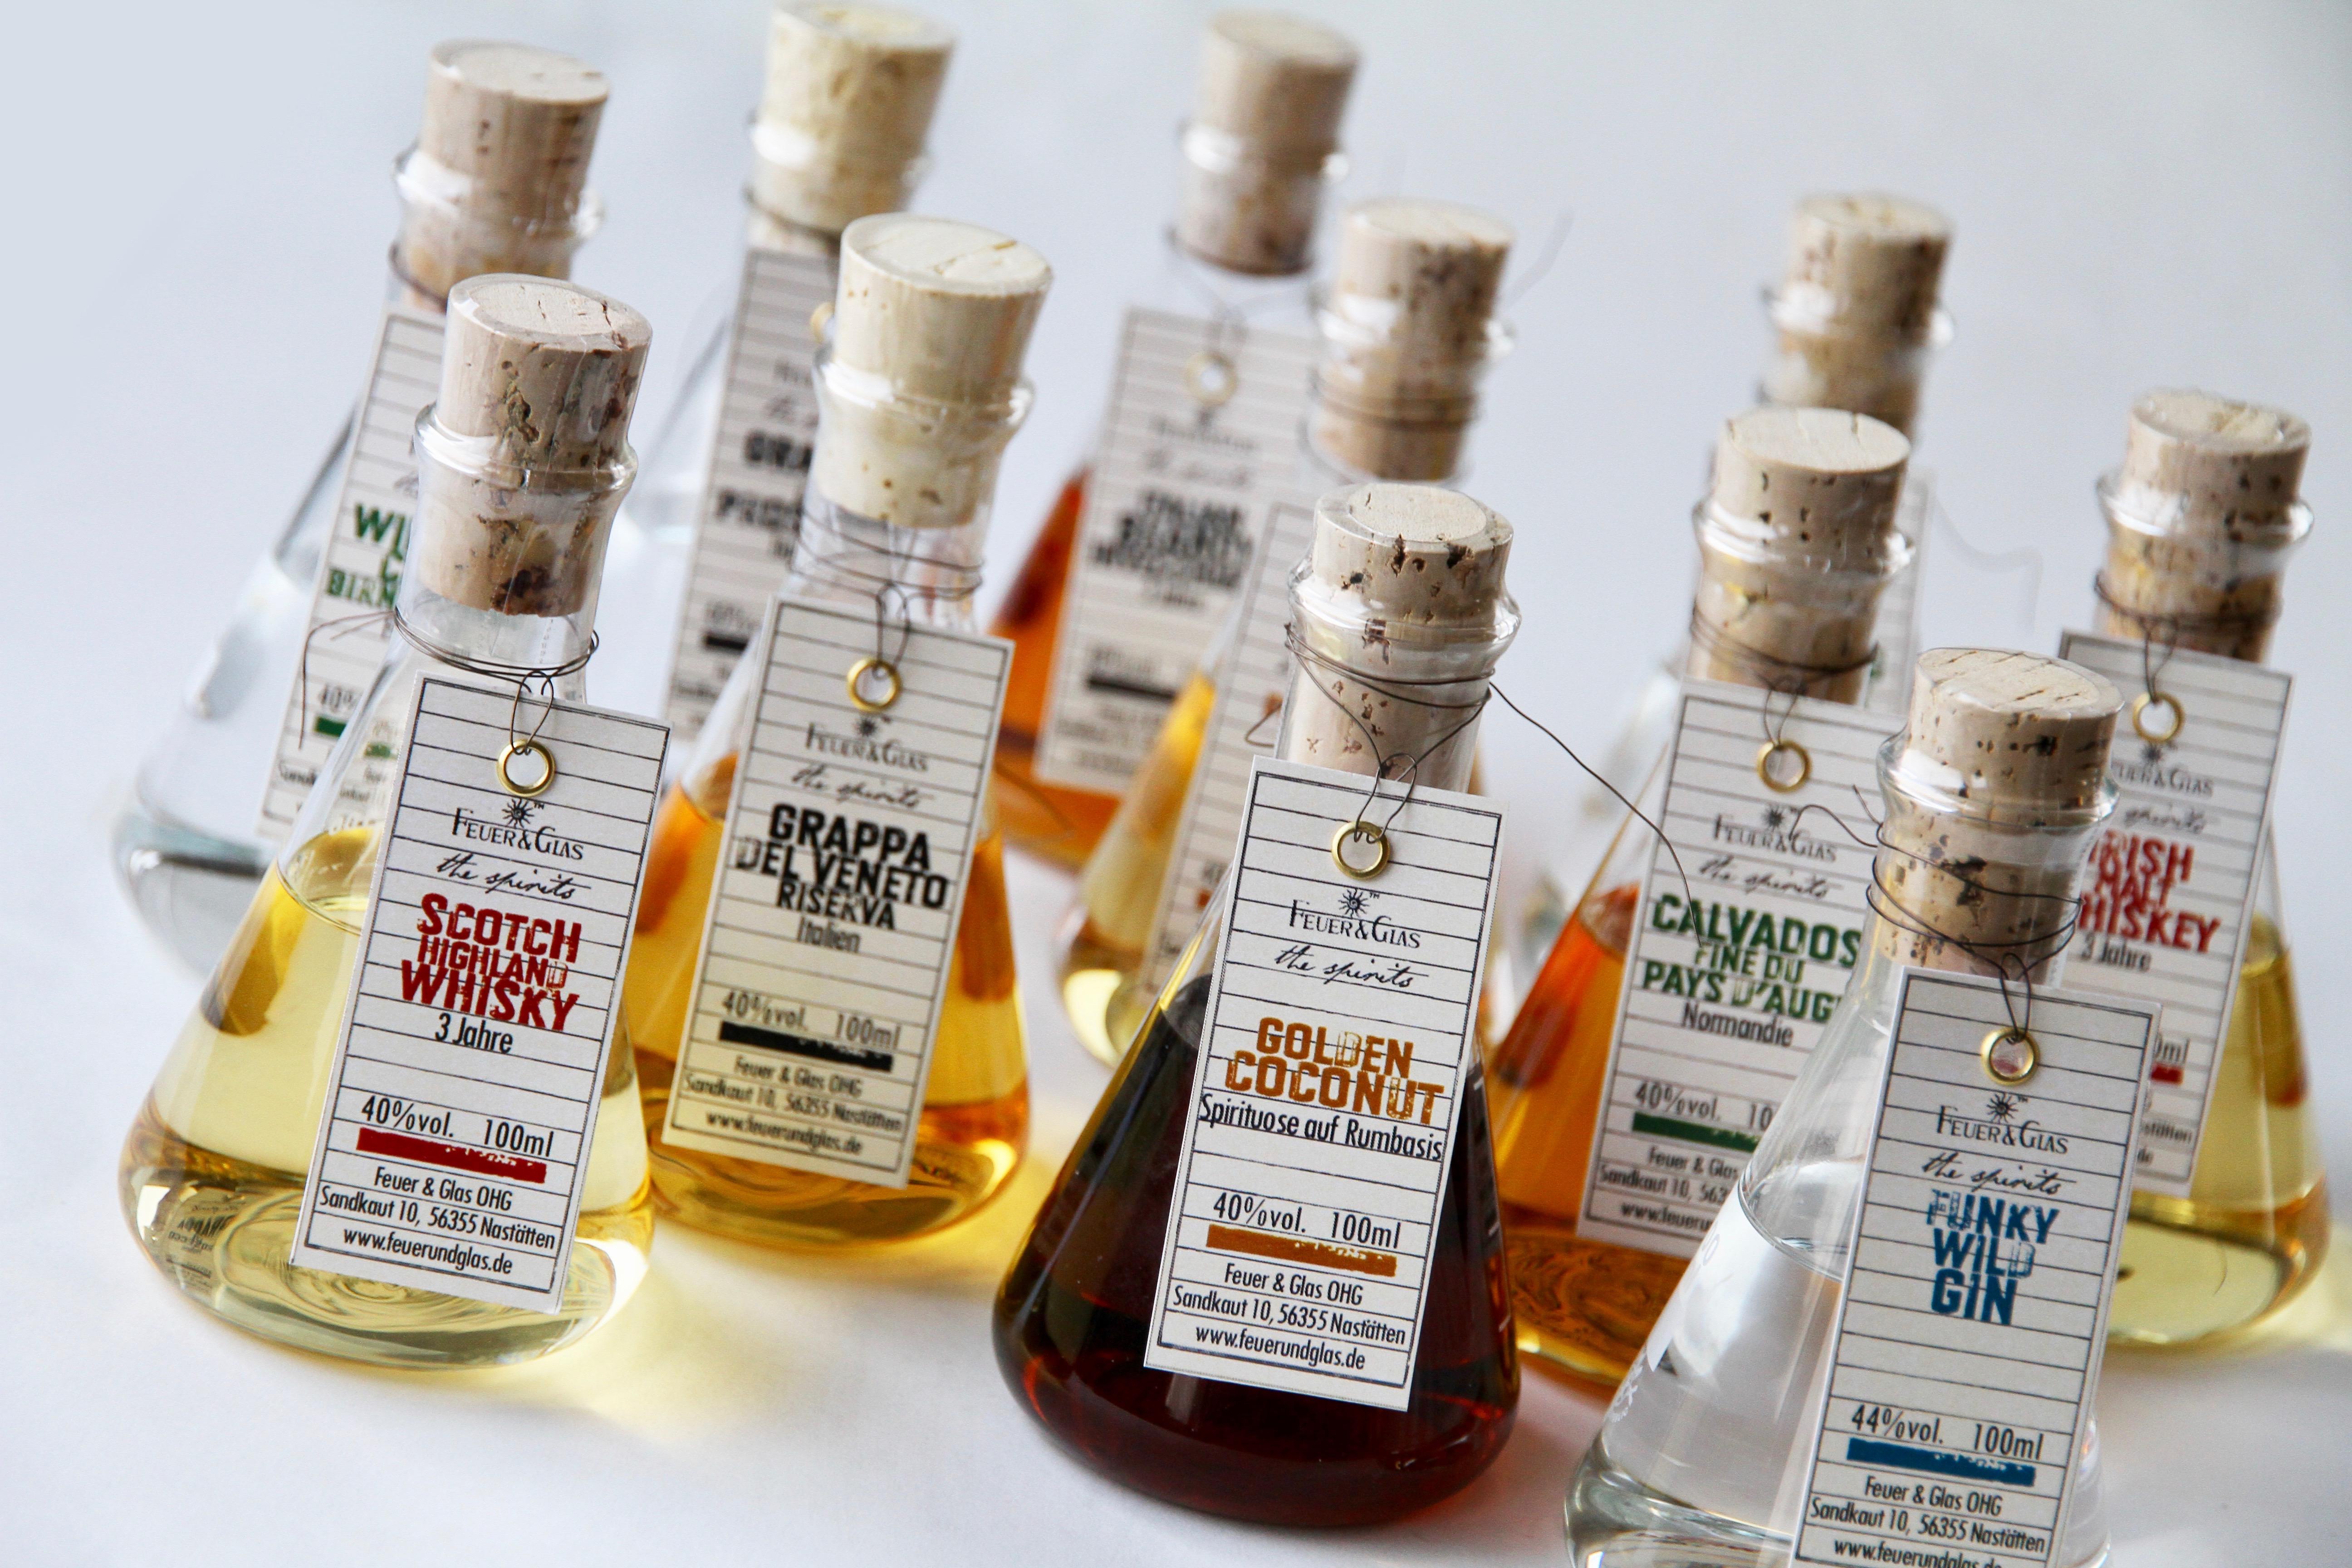 Irish Malt Whisky, 100 ml, 40%  VOL